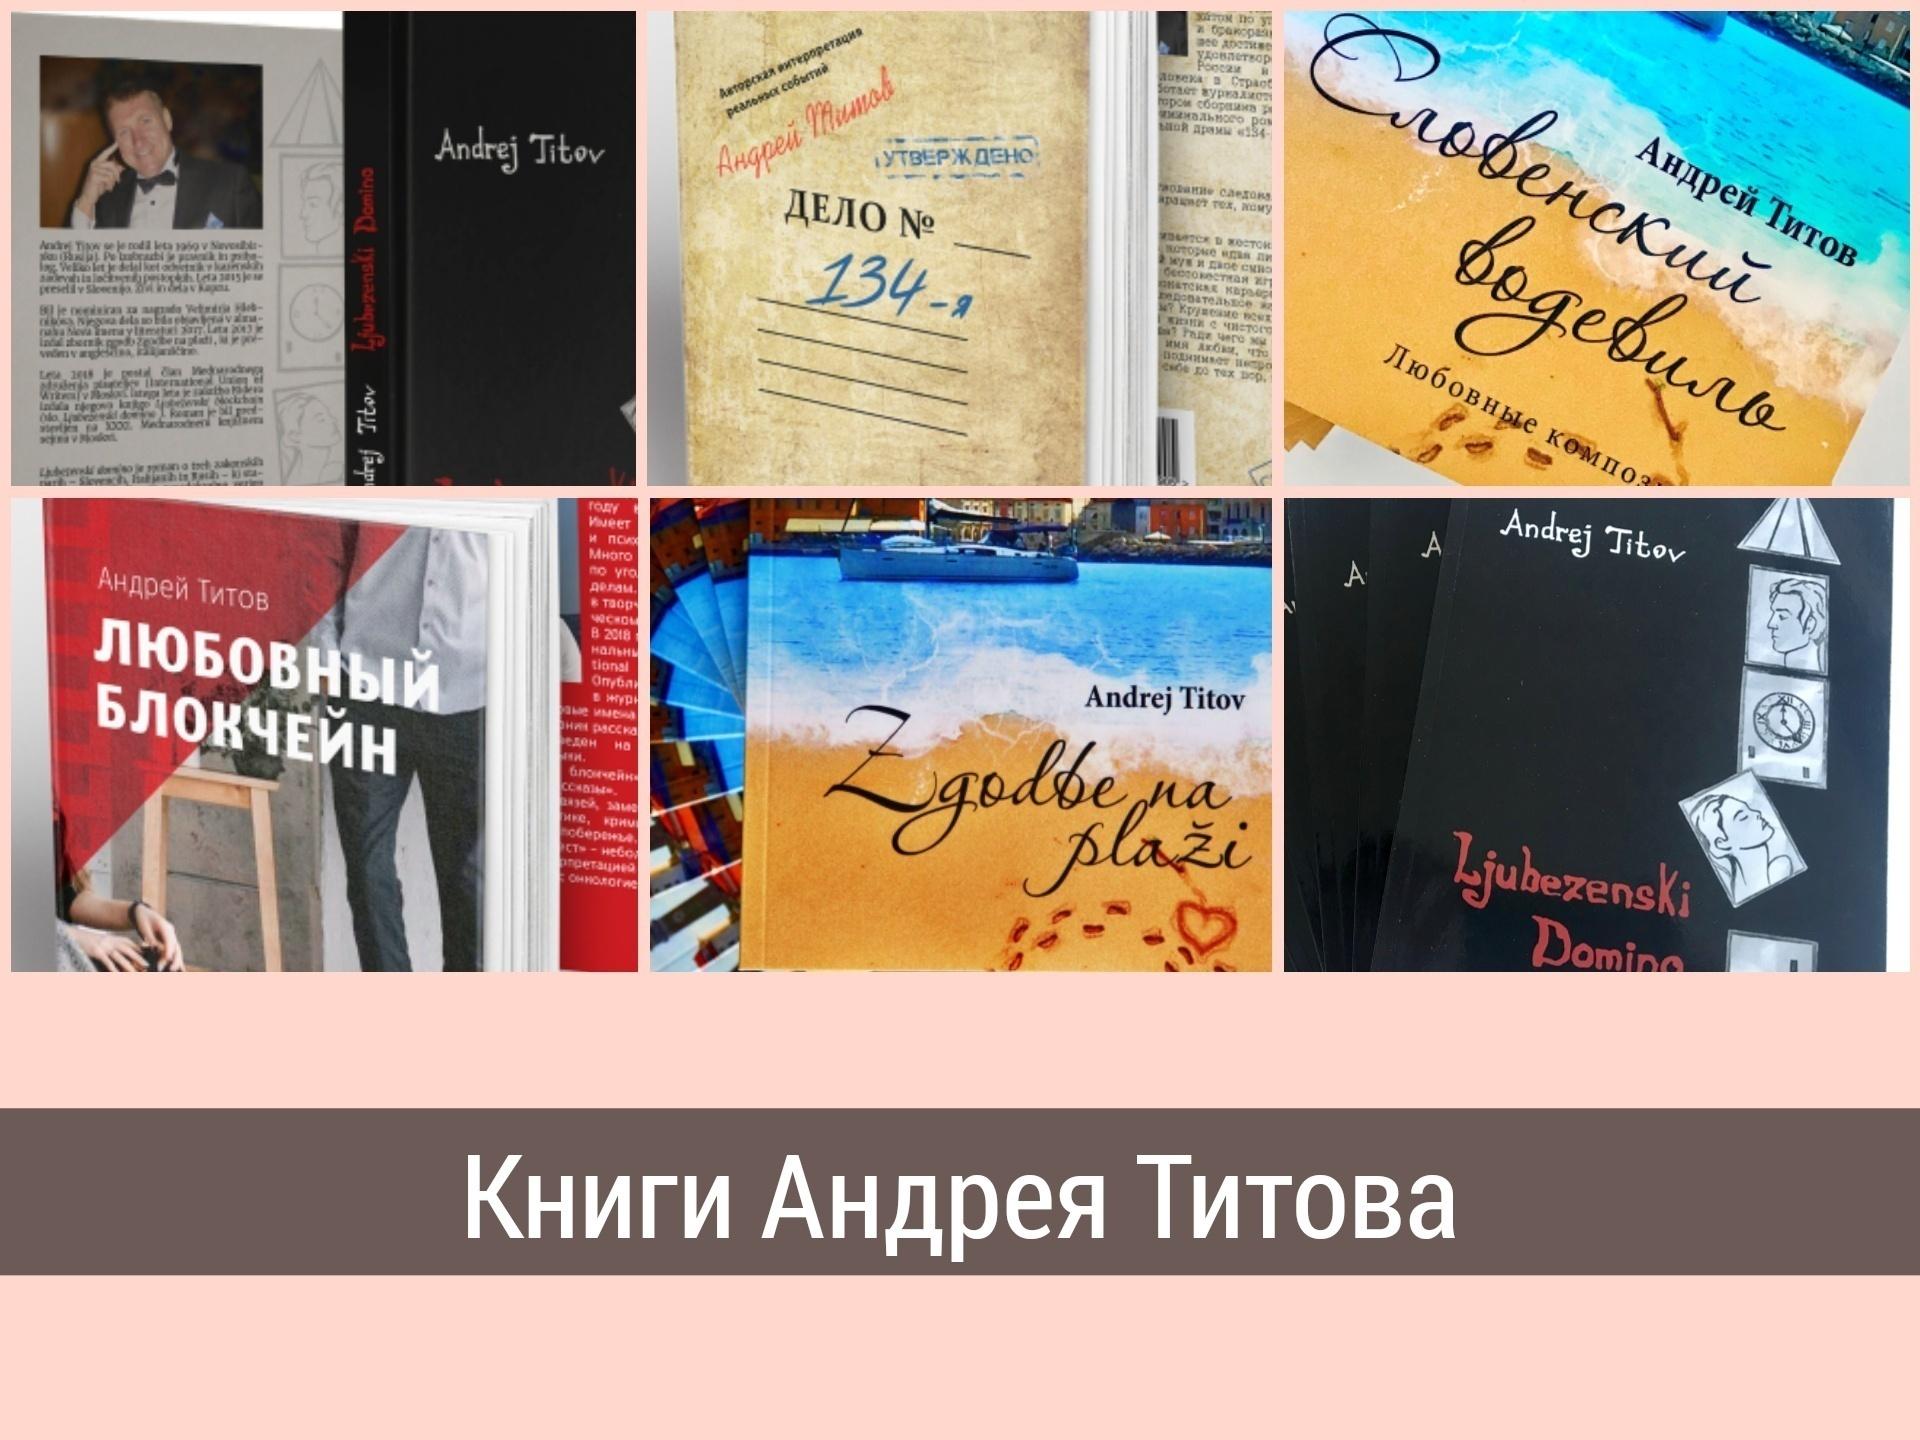 Книги Андрея Титова